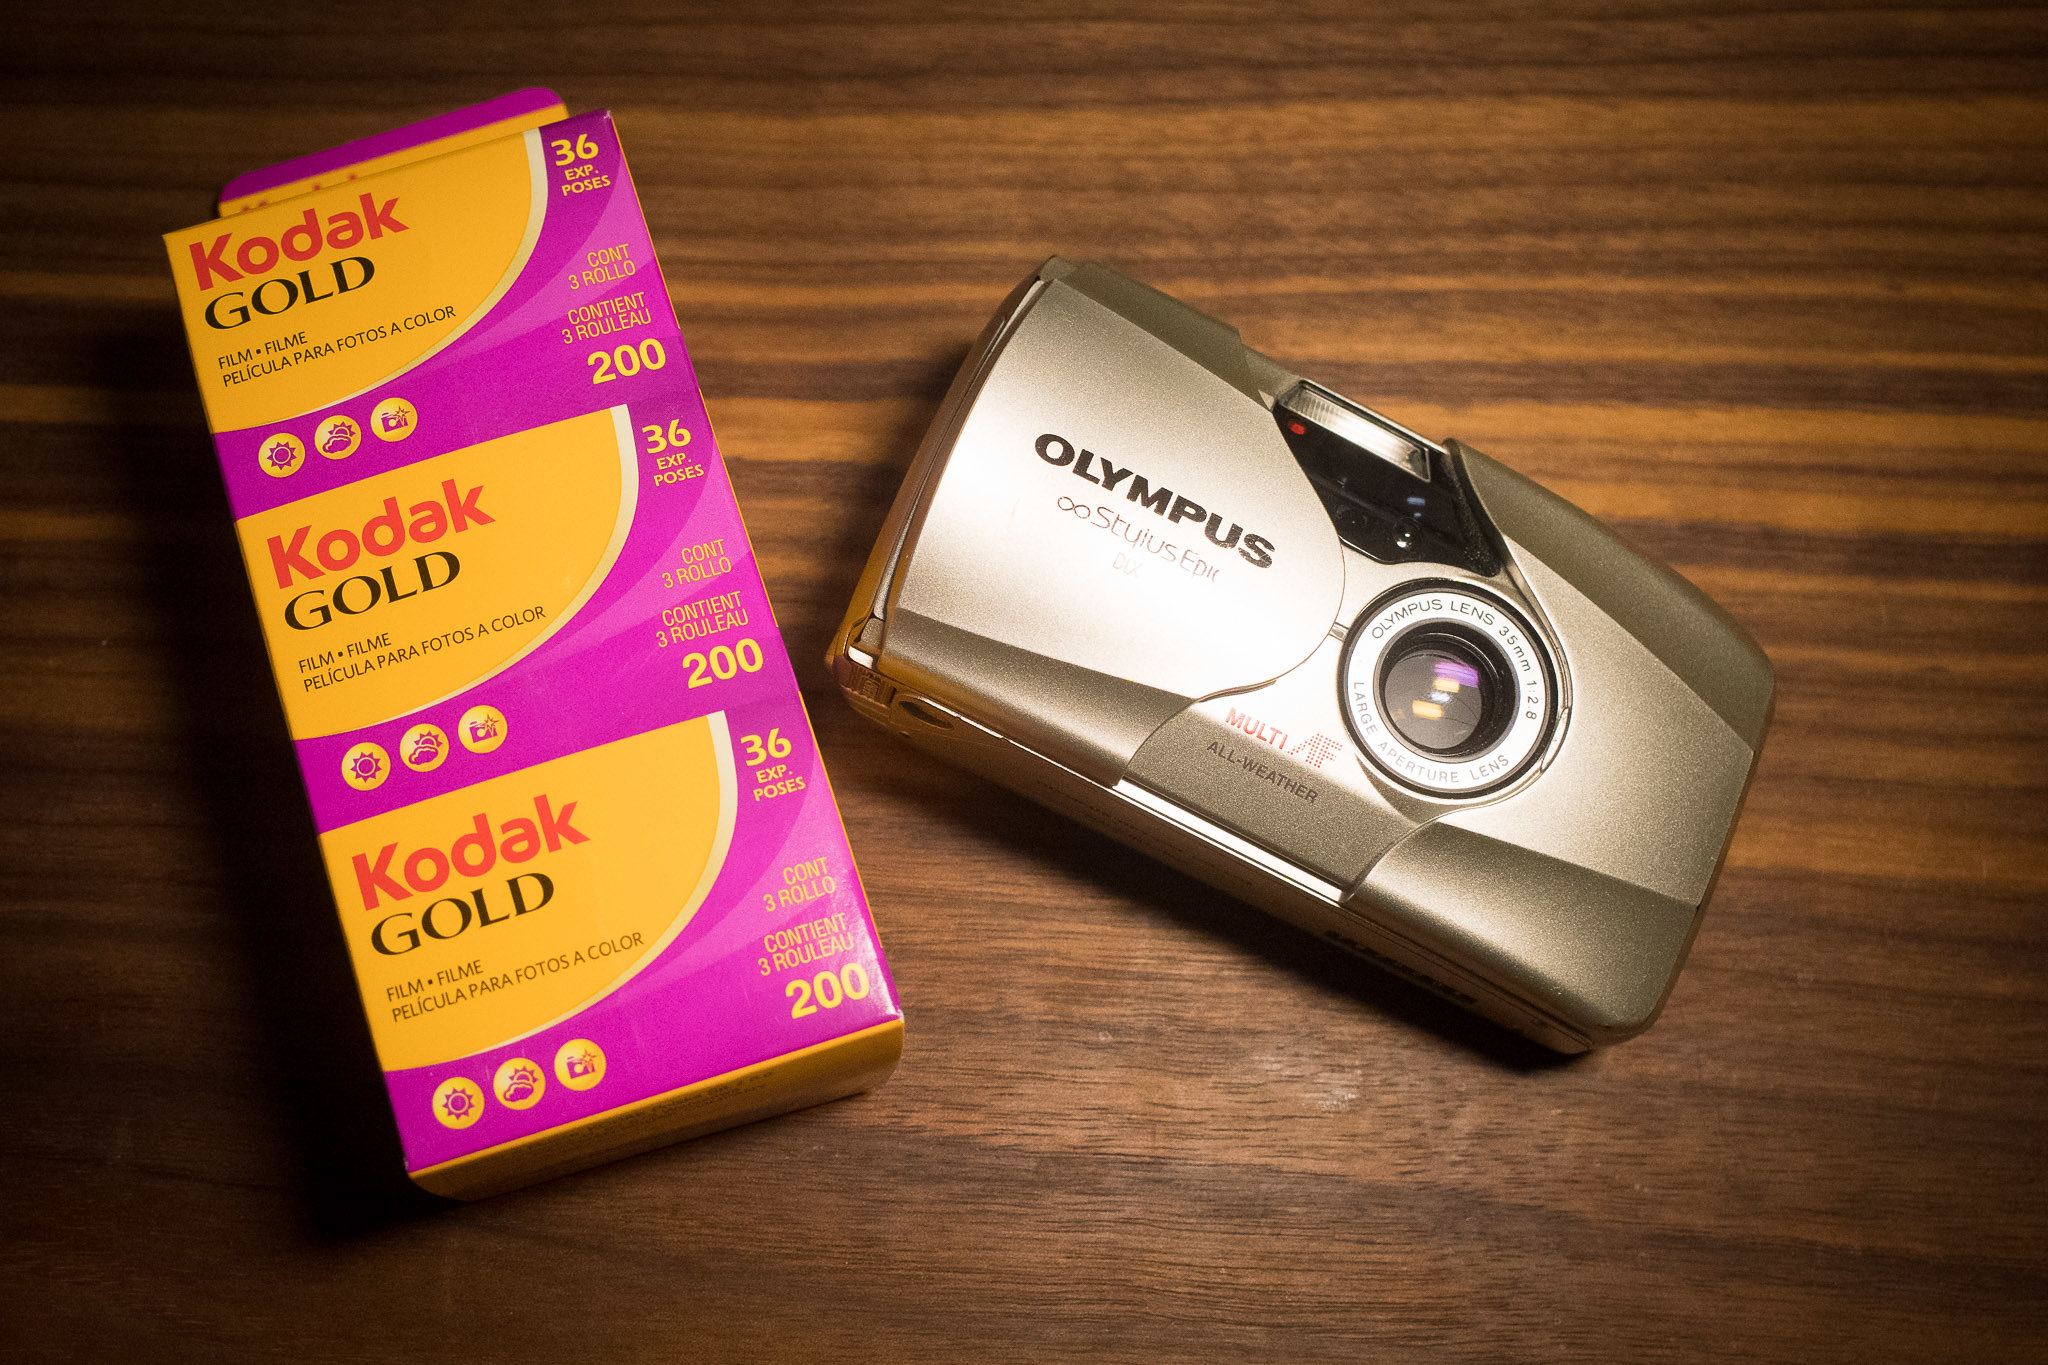 Stylus Epic and Kodak Gold